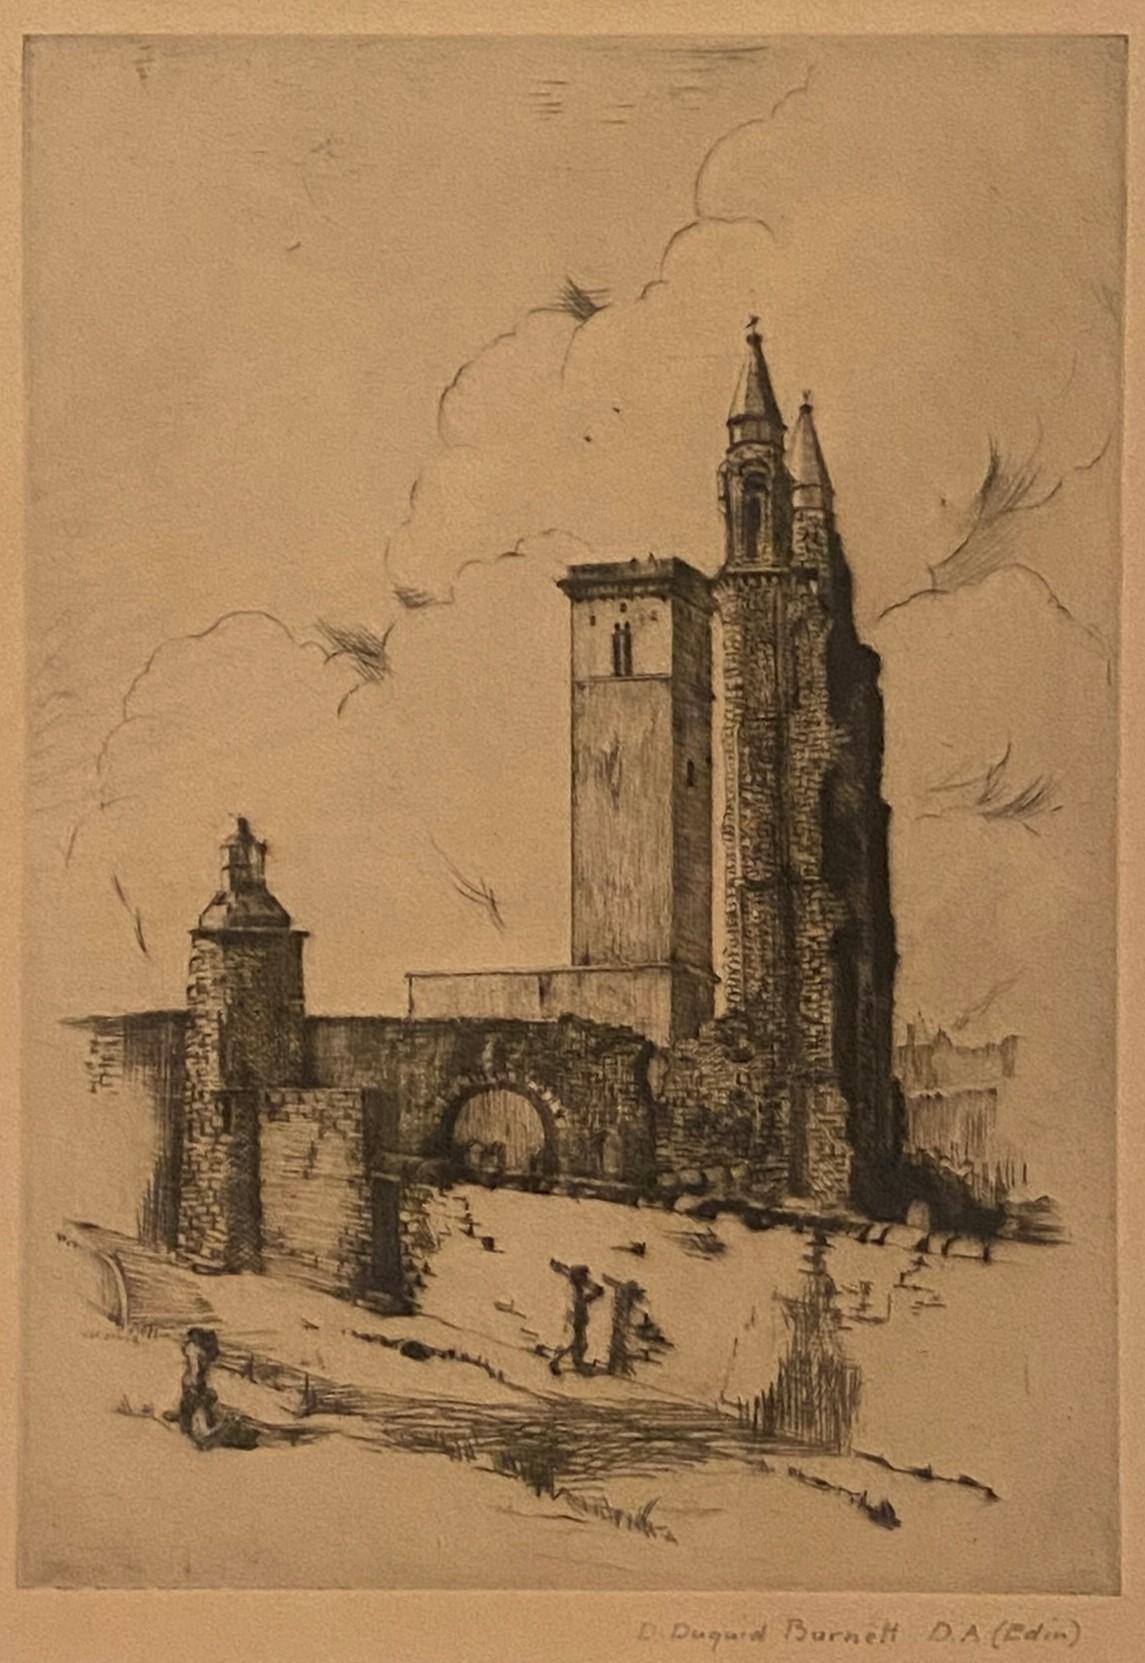 Pencil signed etching by D Dugaird Burnett D.A Edinburgh – Edinburgh View